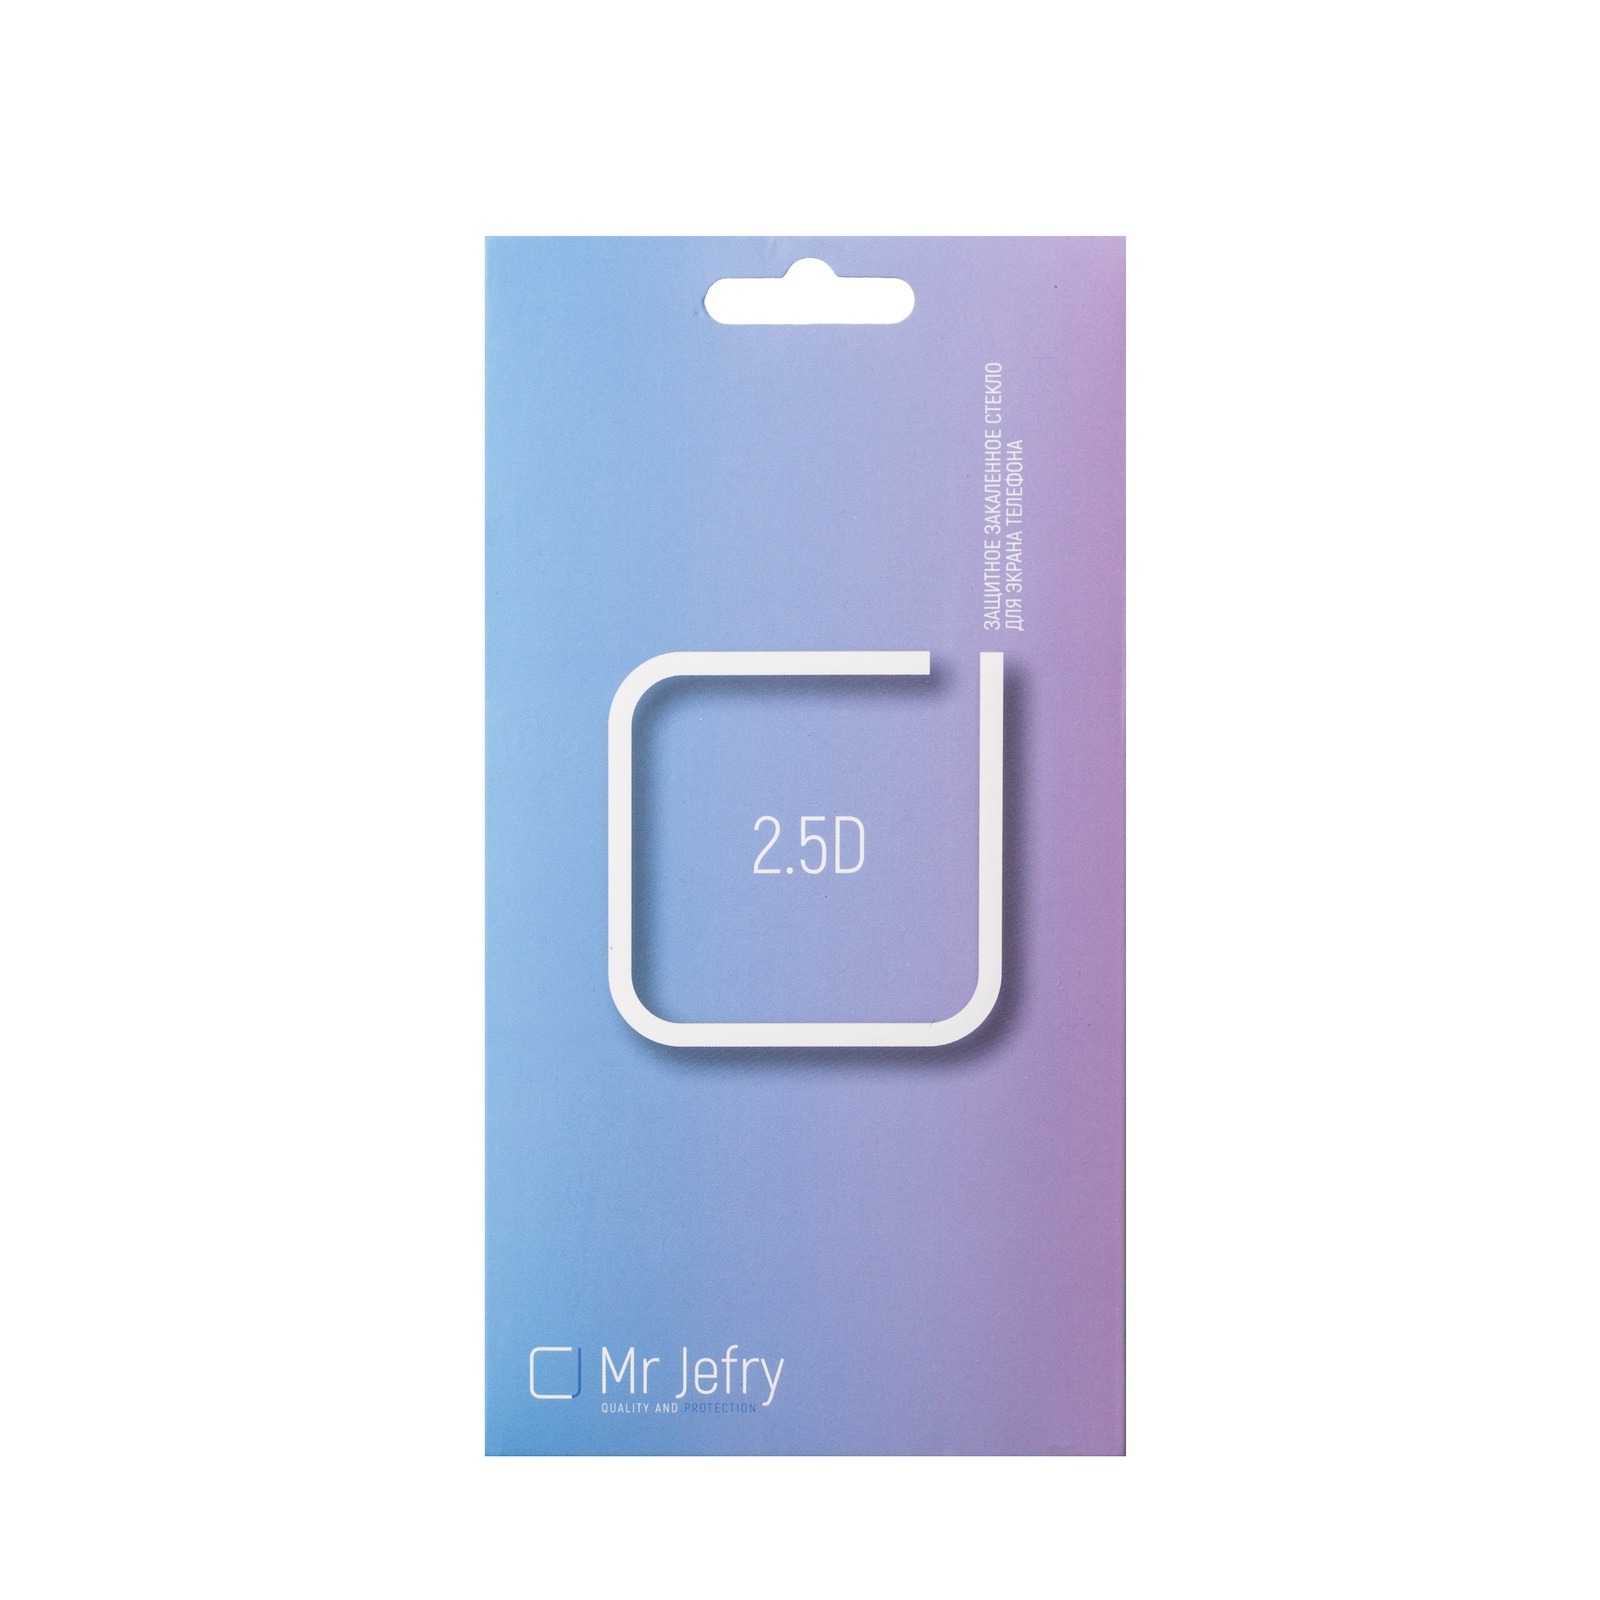 Mr Jefry стекло защитное (многослойное) 2,5D для Xiaomi Redmi 4X